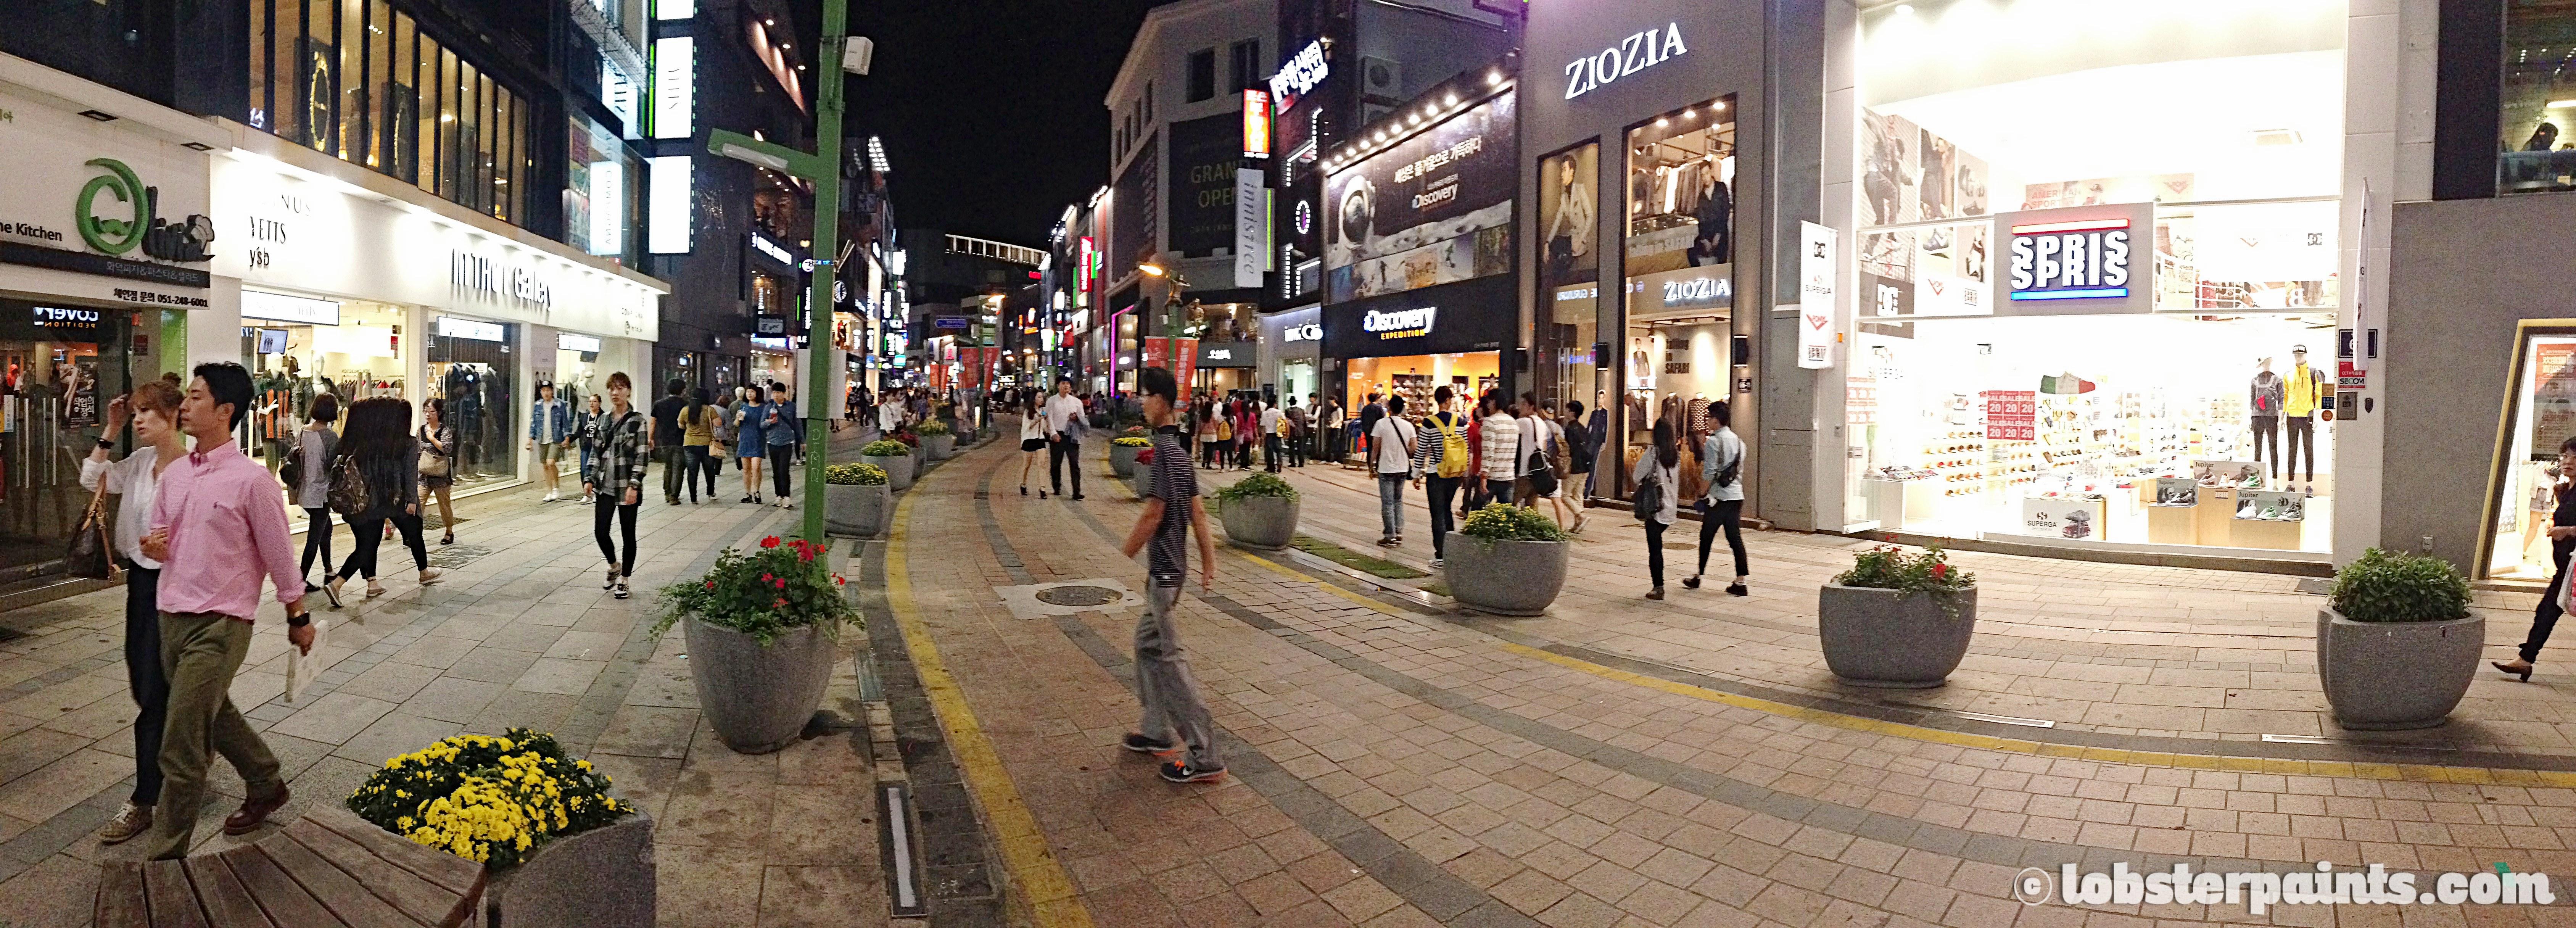 27 Sep 2014: Gwangbok-ro Culture & Fashion Street